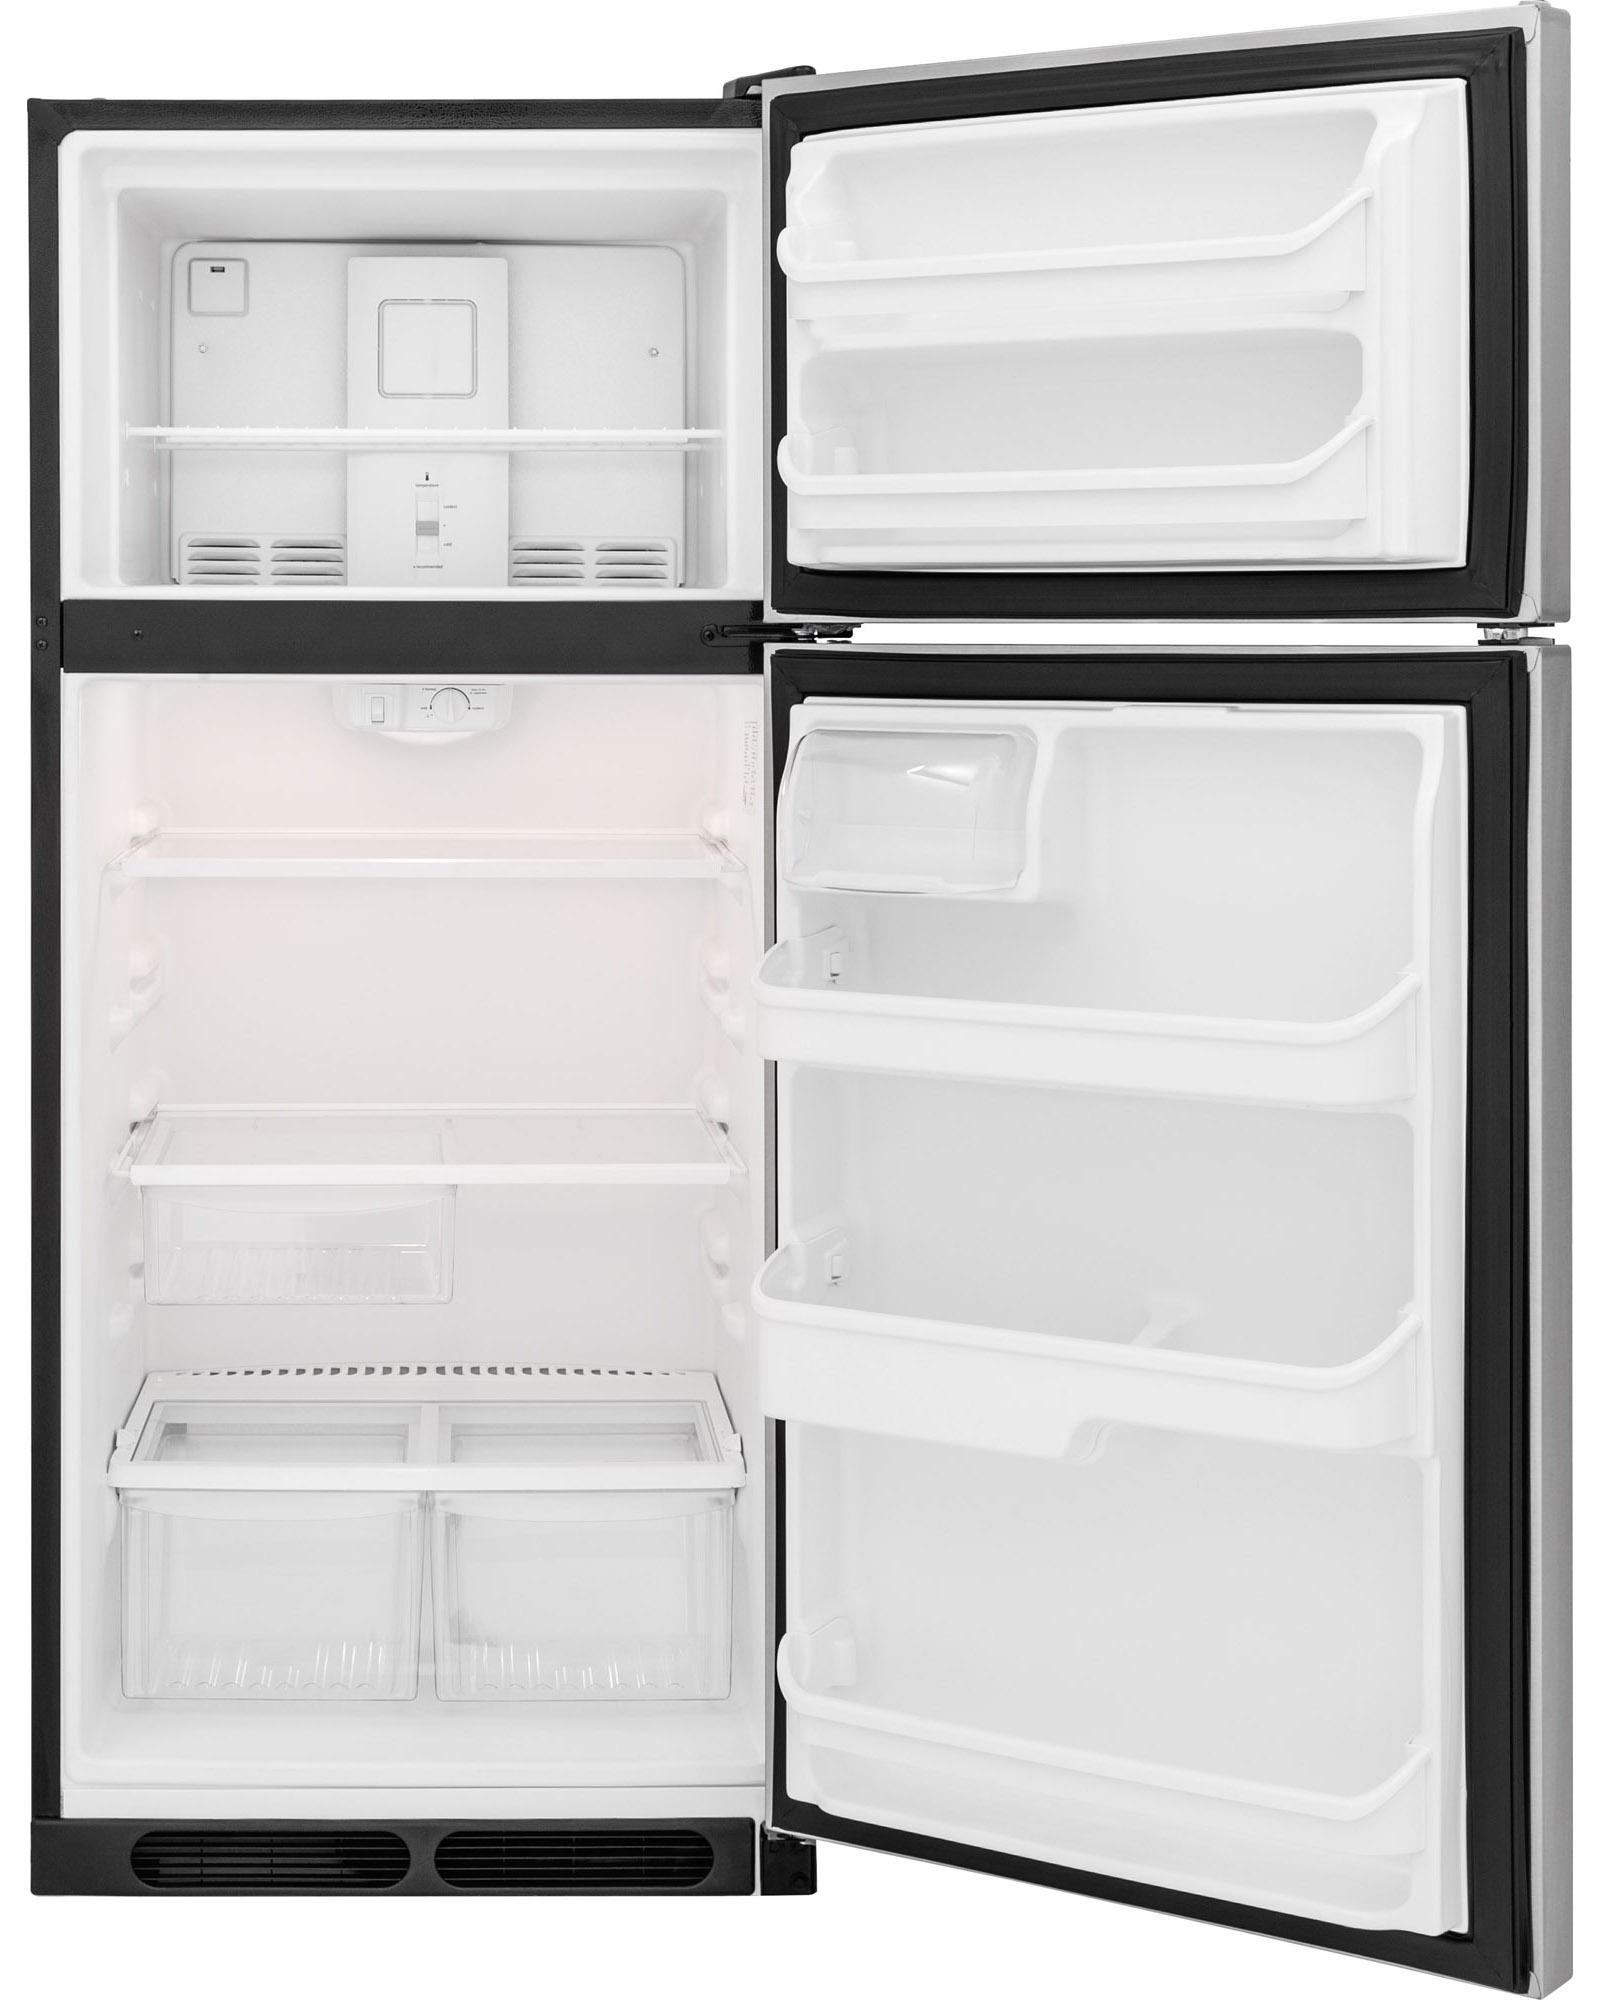 Frigidaire FFHT1621QS 16.3 cu. ft. Top-Mount Refrigerator - Stainless Steel